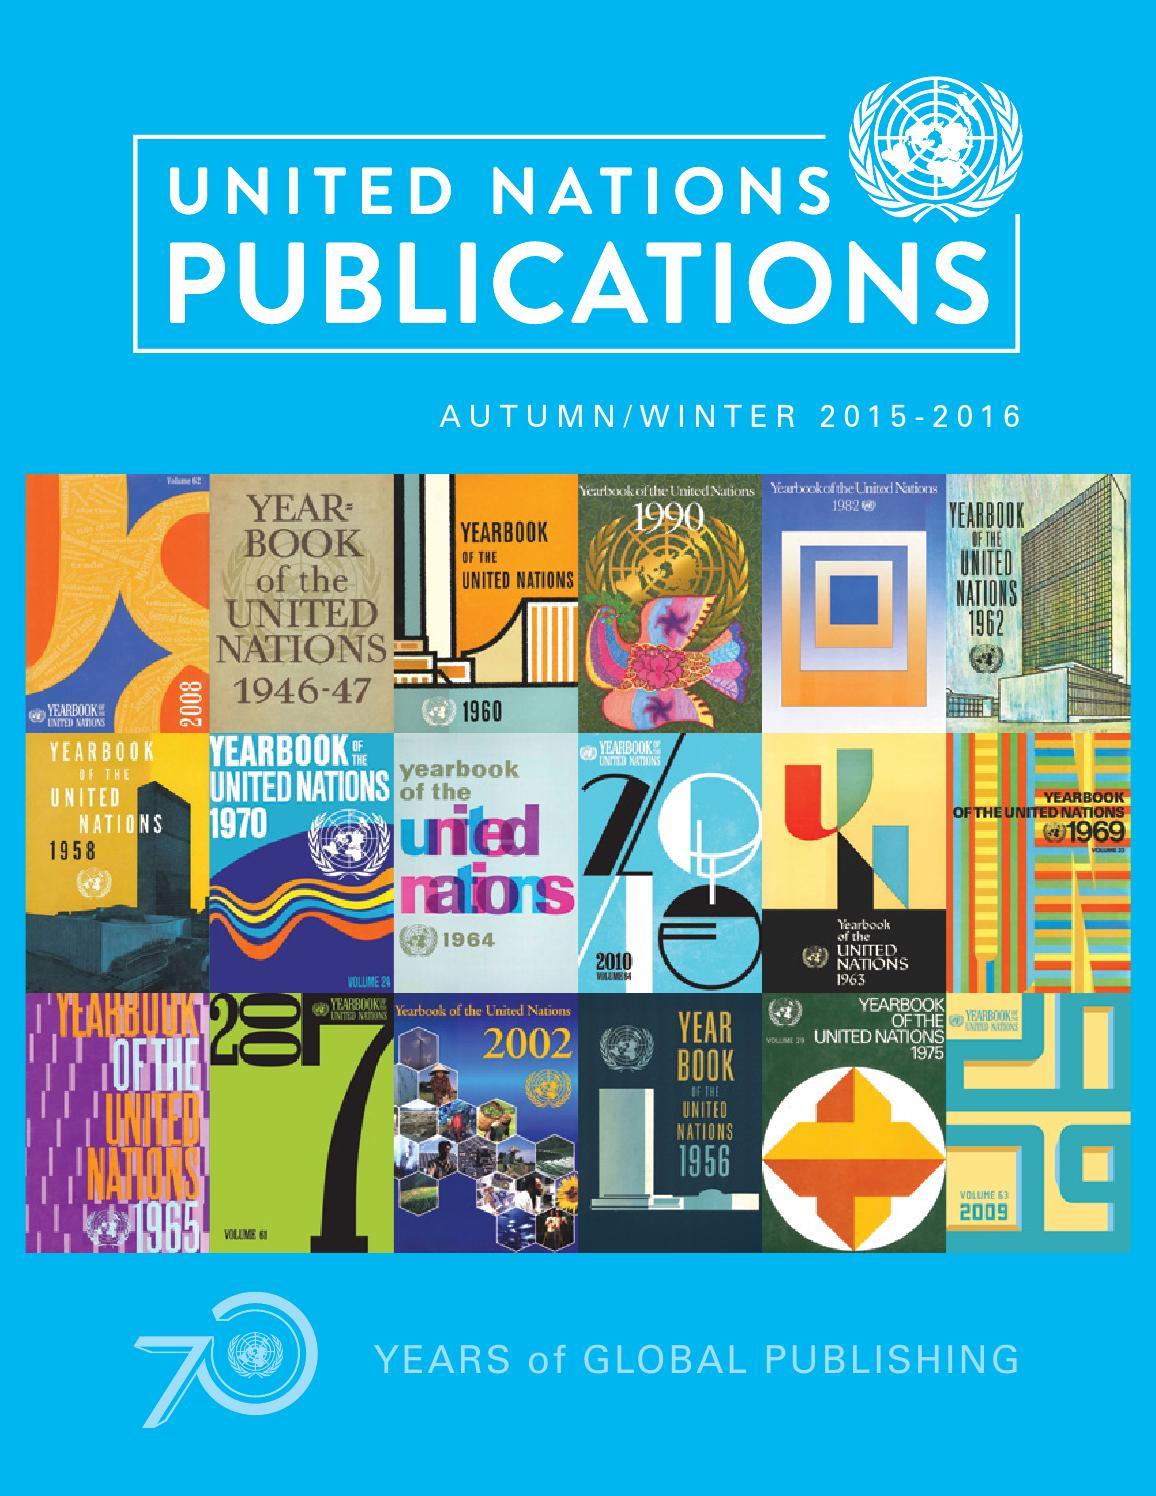 UN Publications Autumn Winter 2015 2016 Catalogue by United Nations  Publications - issuu a22e0e812c